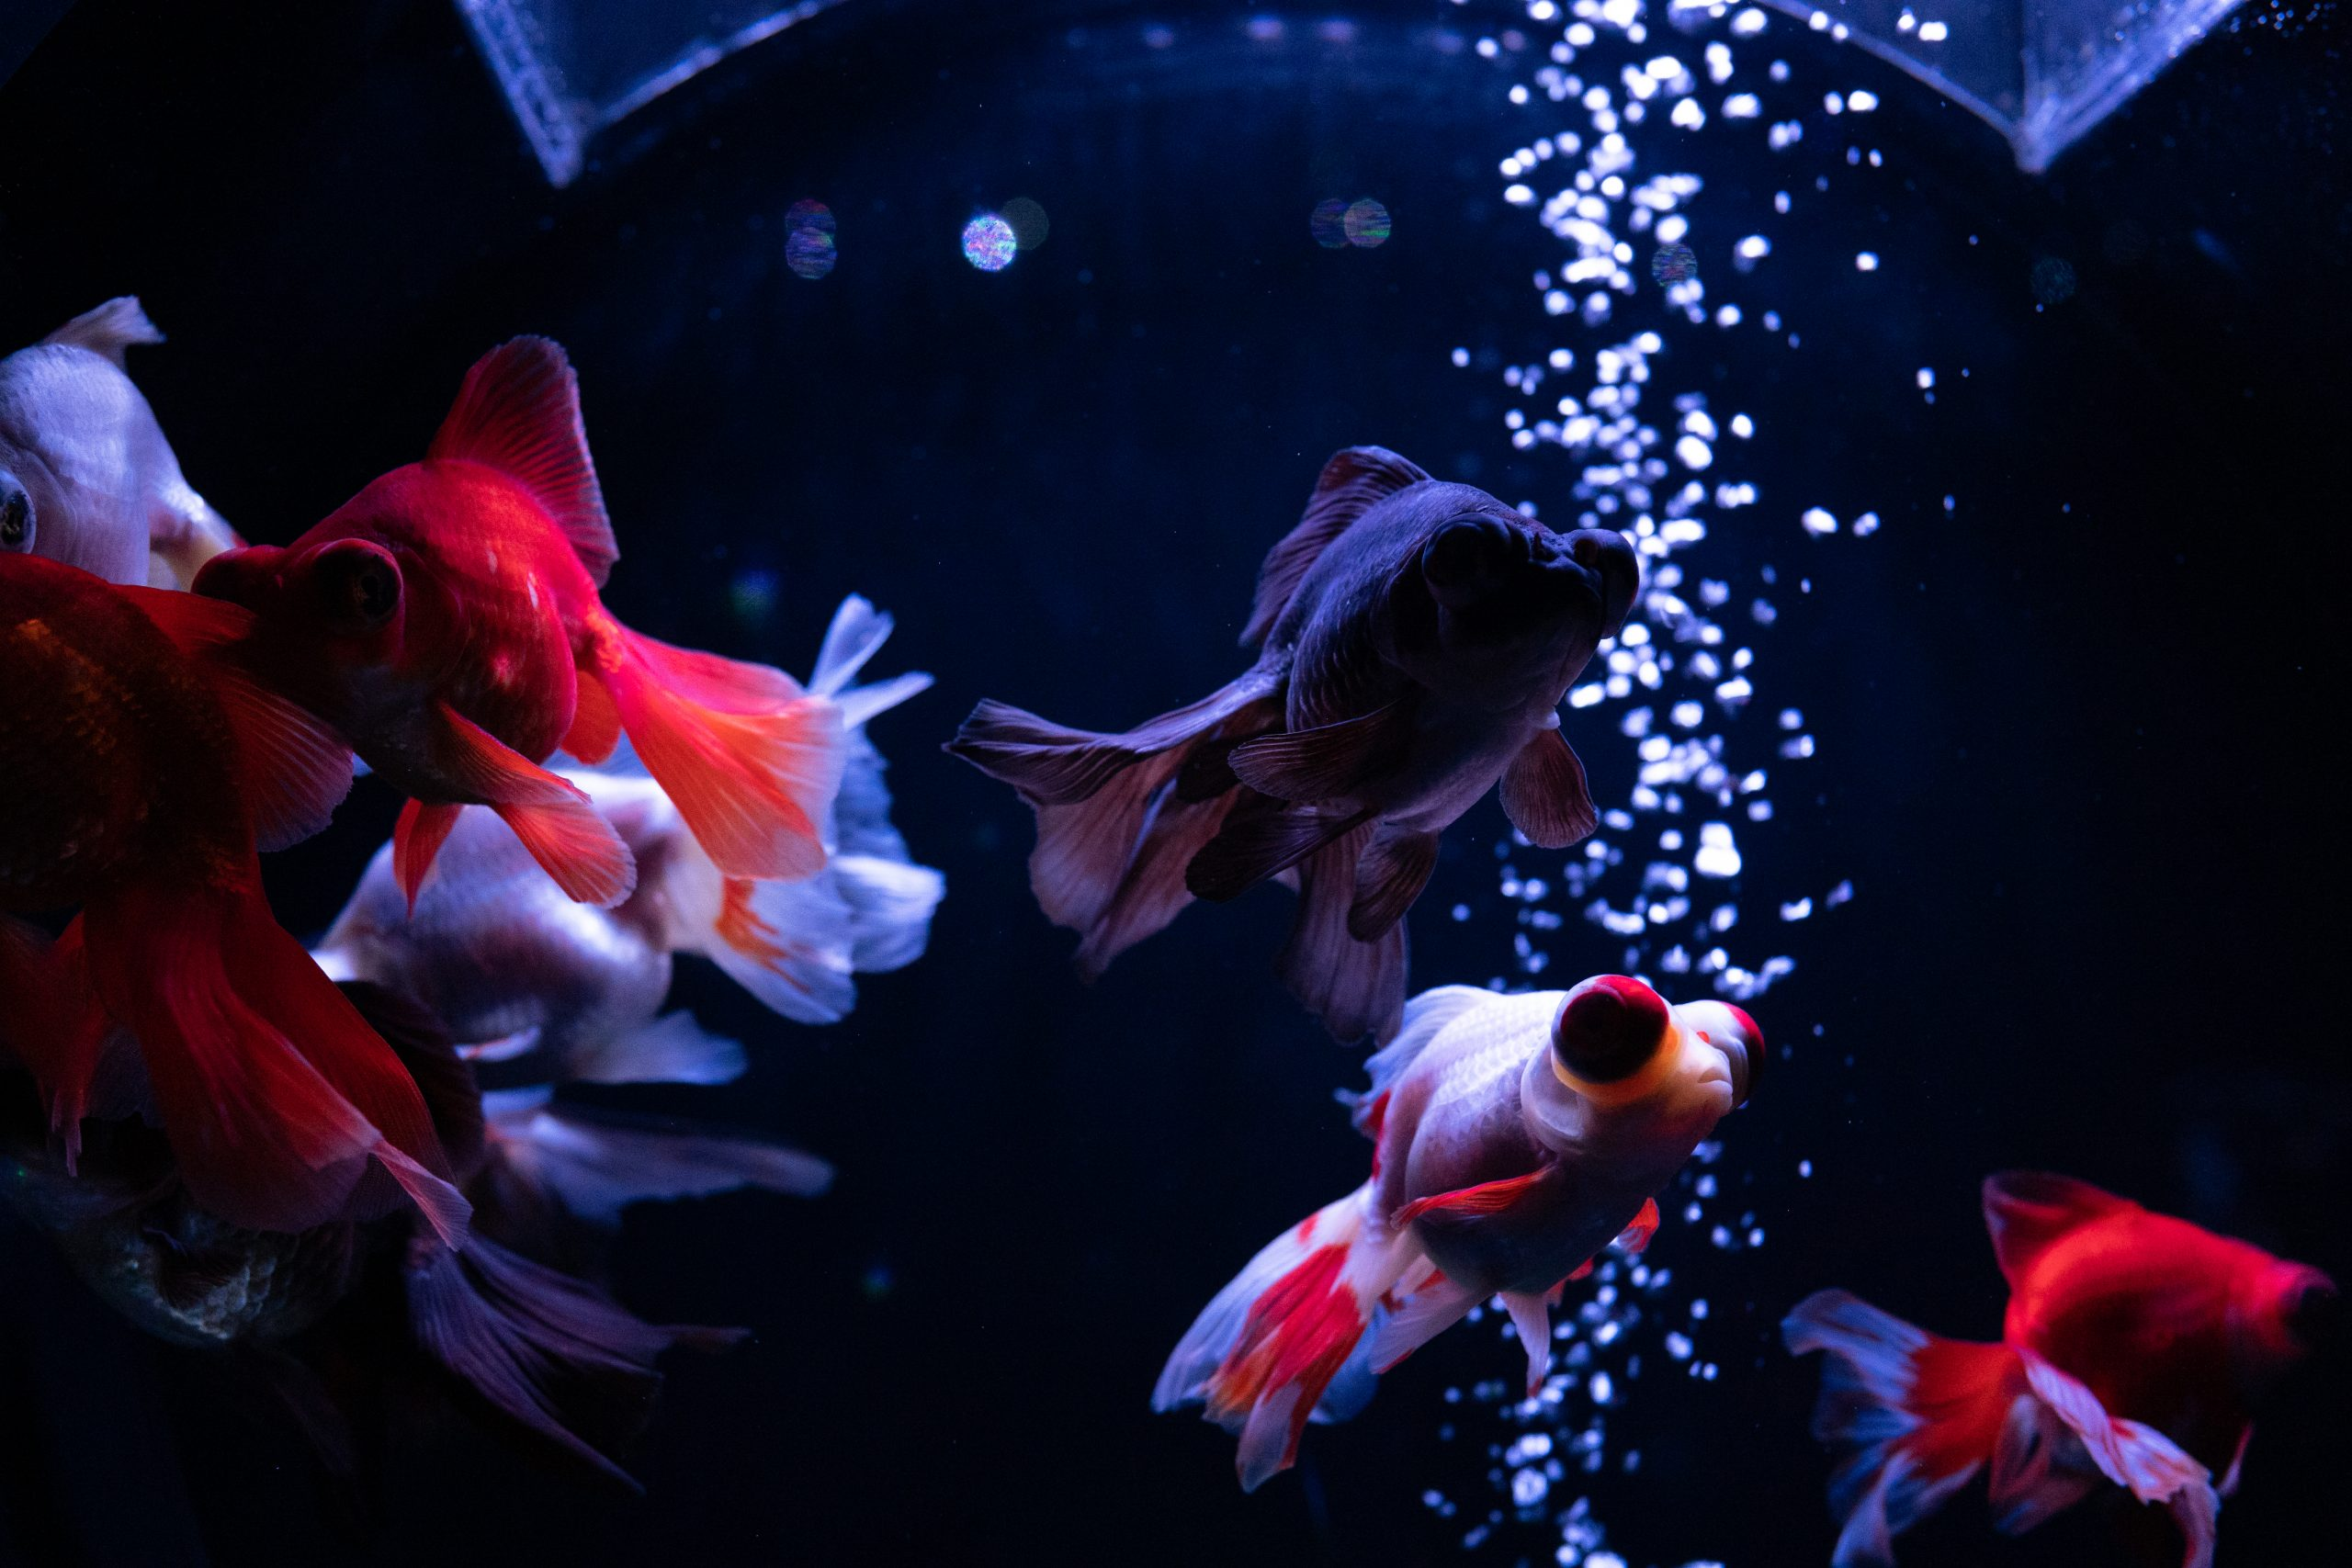 【SONY】低照度の環境で金魚を撮影するチャレンジ